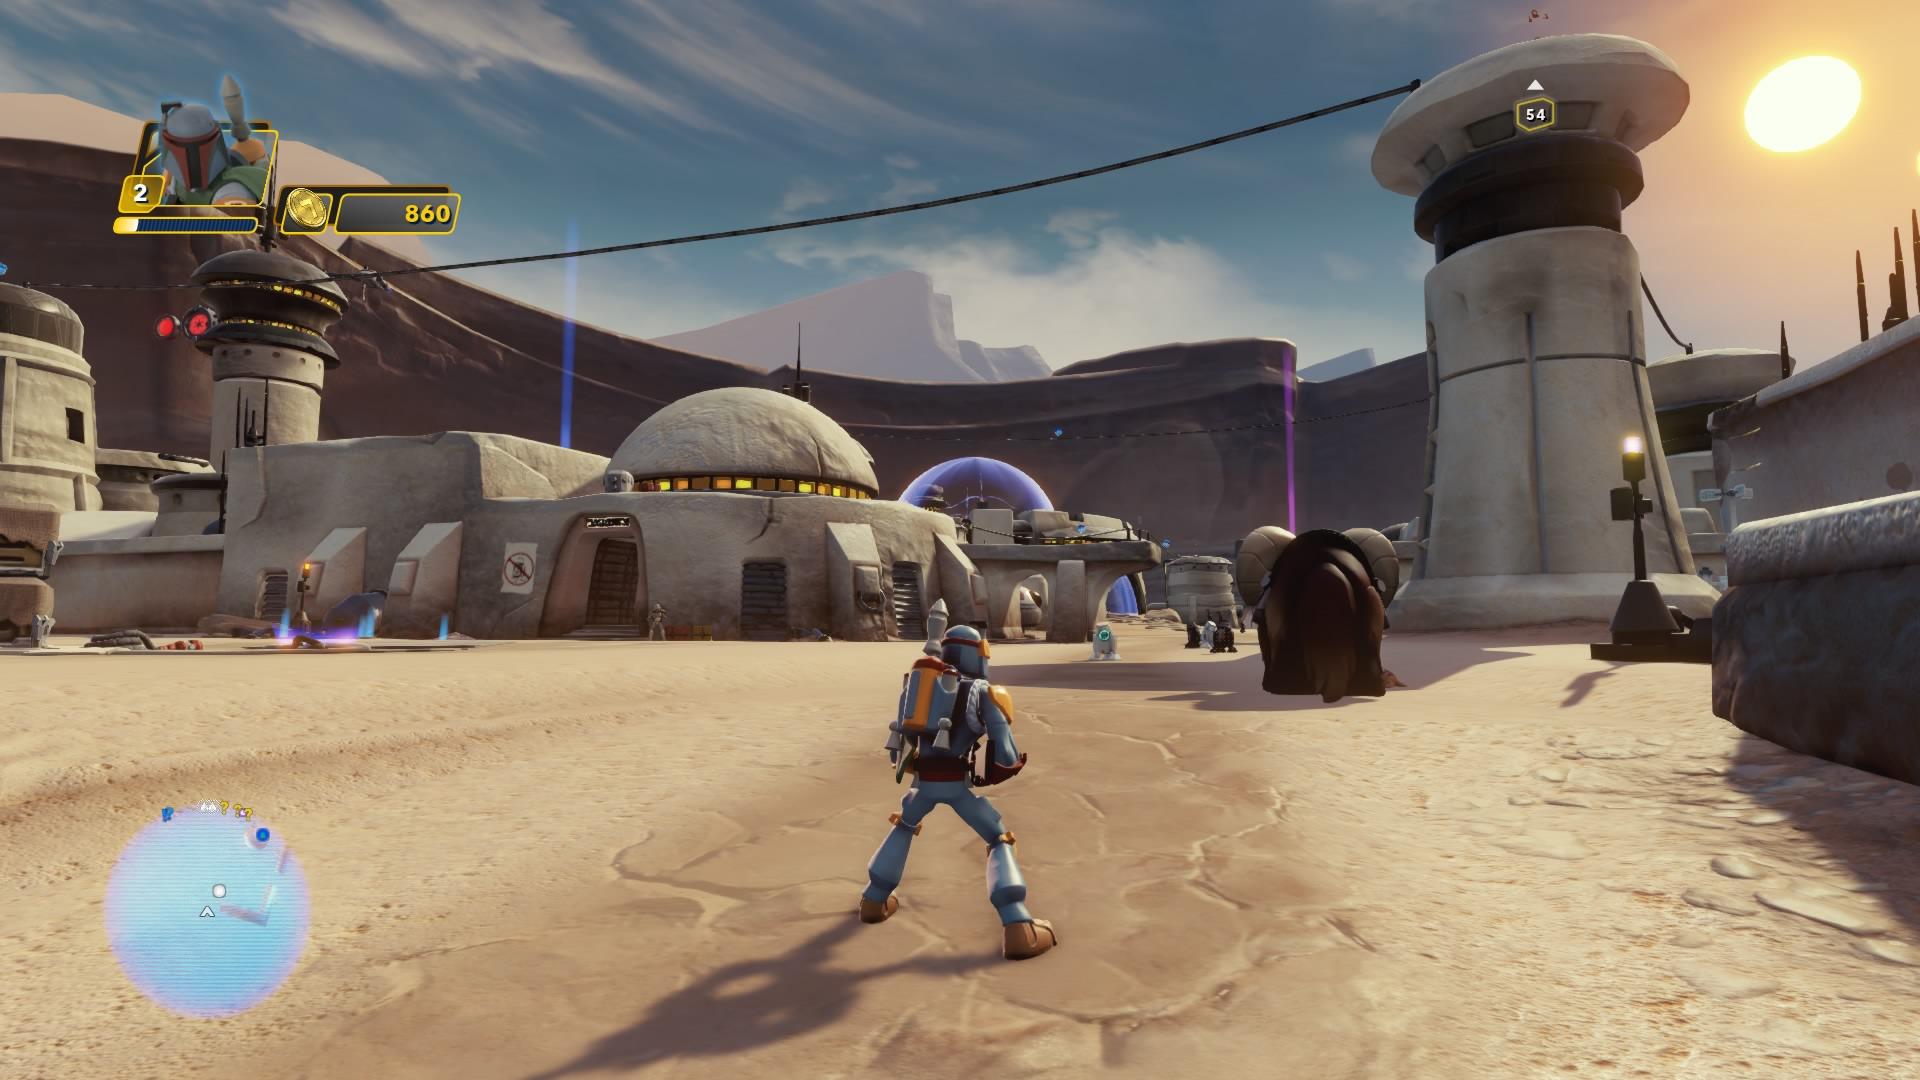 Schon cool: Playset Rise against the Empire. Zurück zum Ursprung.